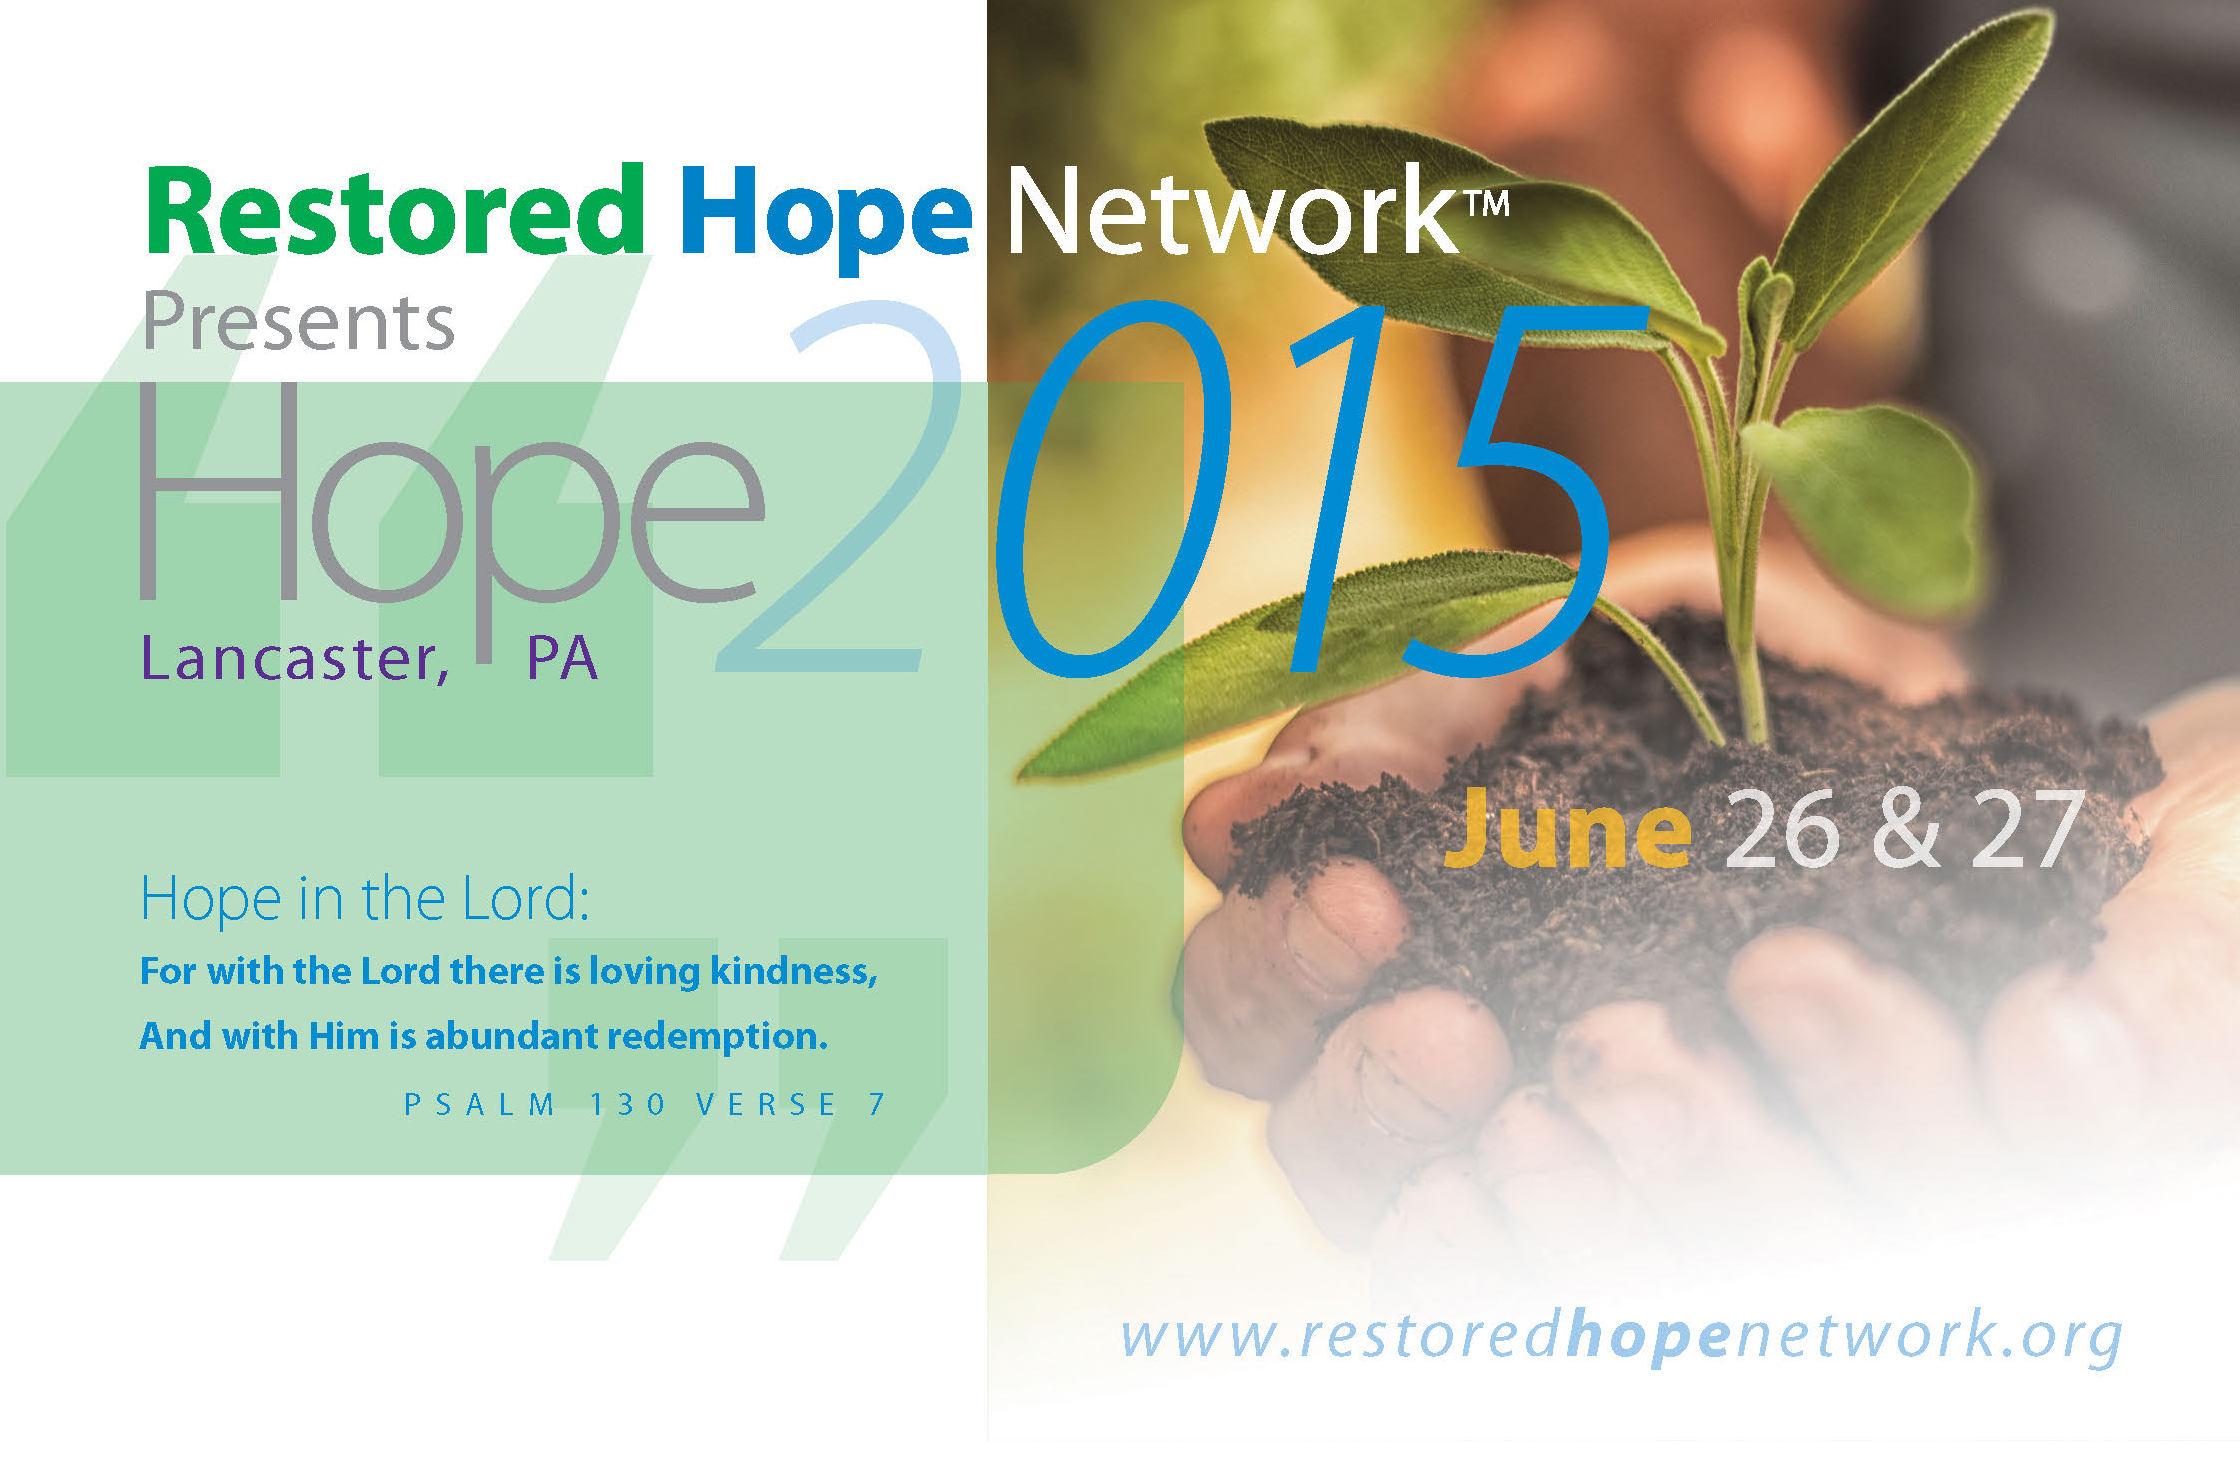 HOPE 2015 flier_front